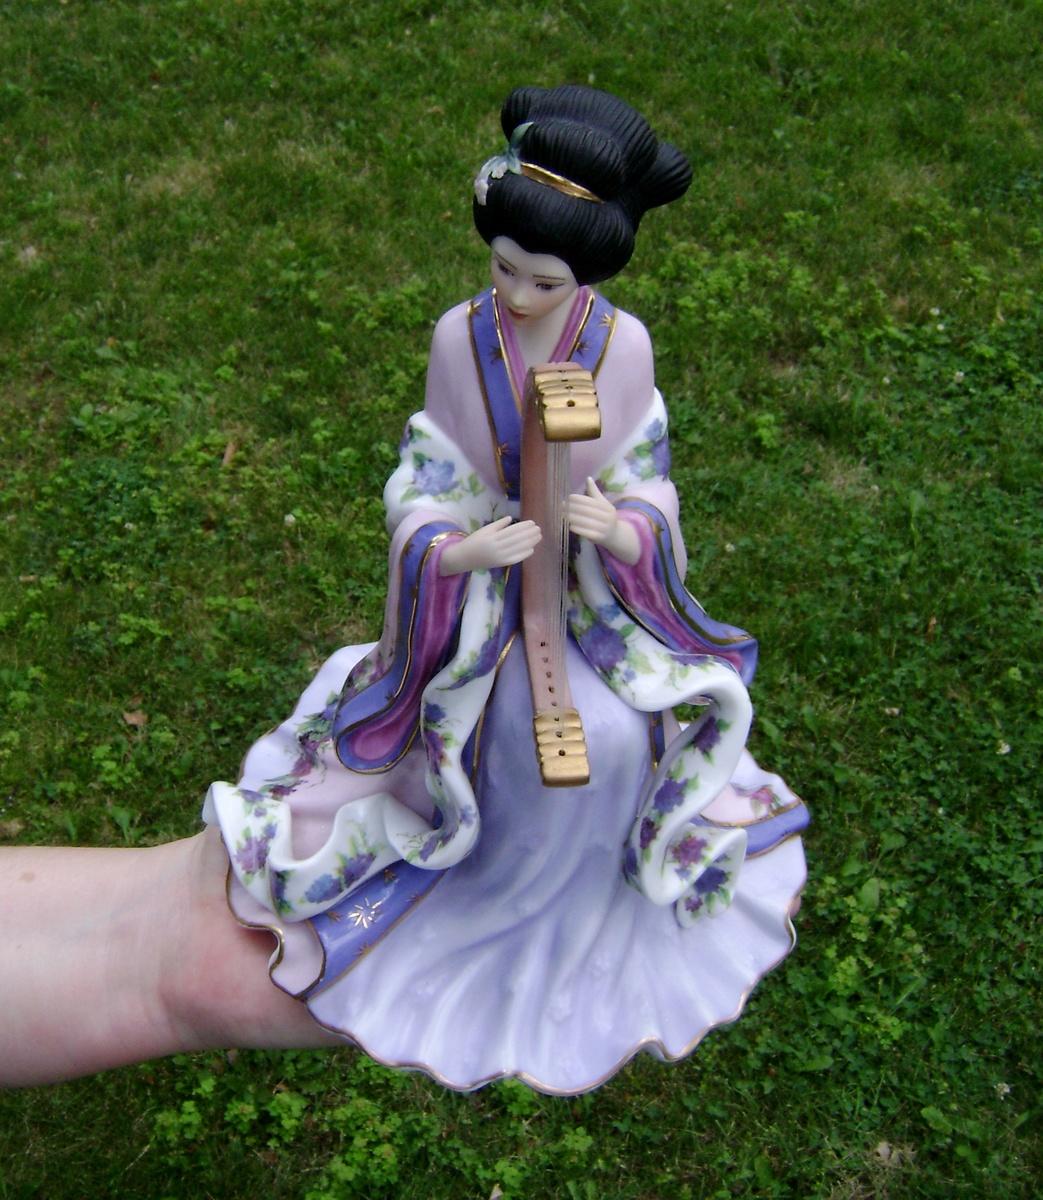 Harp princess by lena liu the danbury mint collectors for The danbury